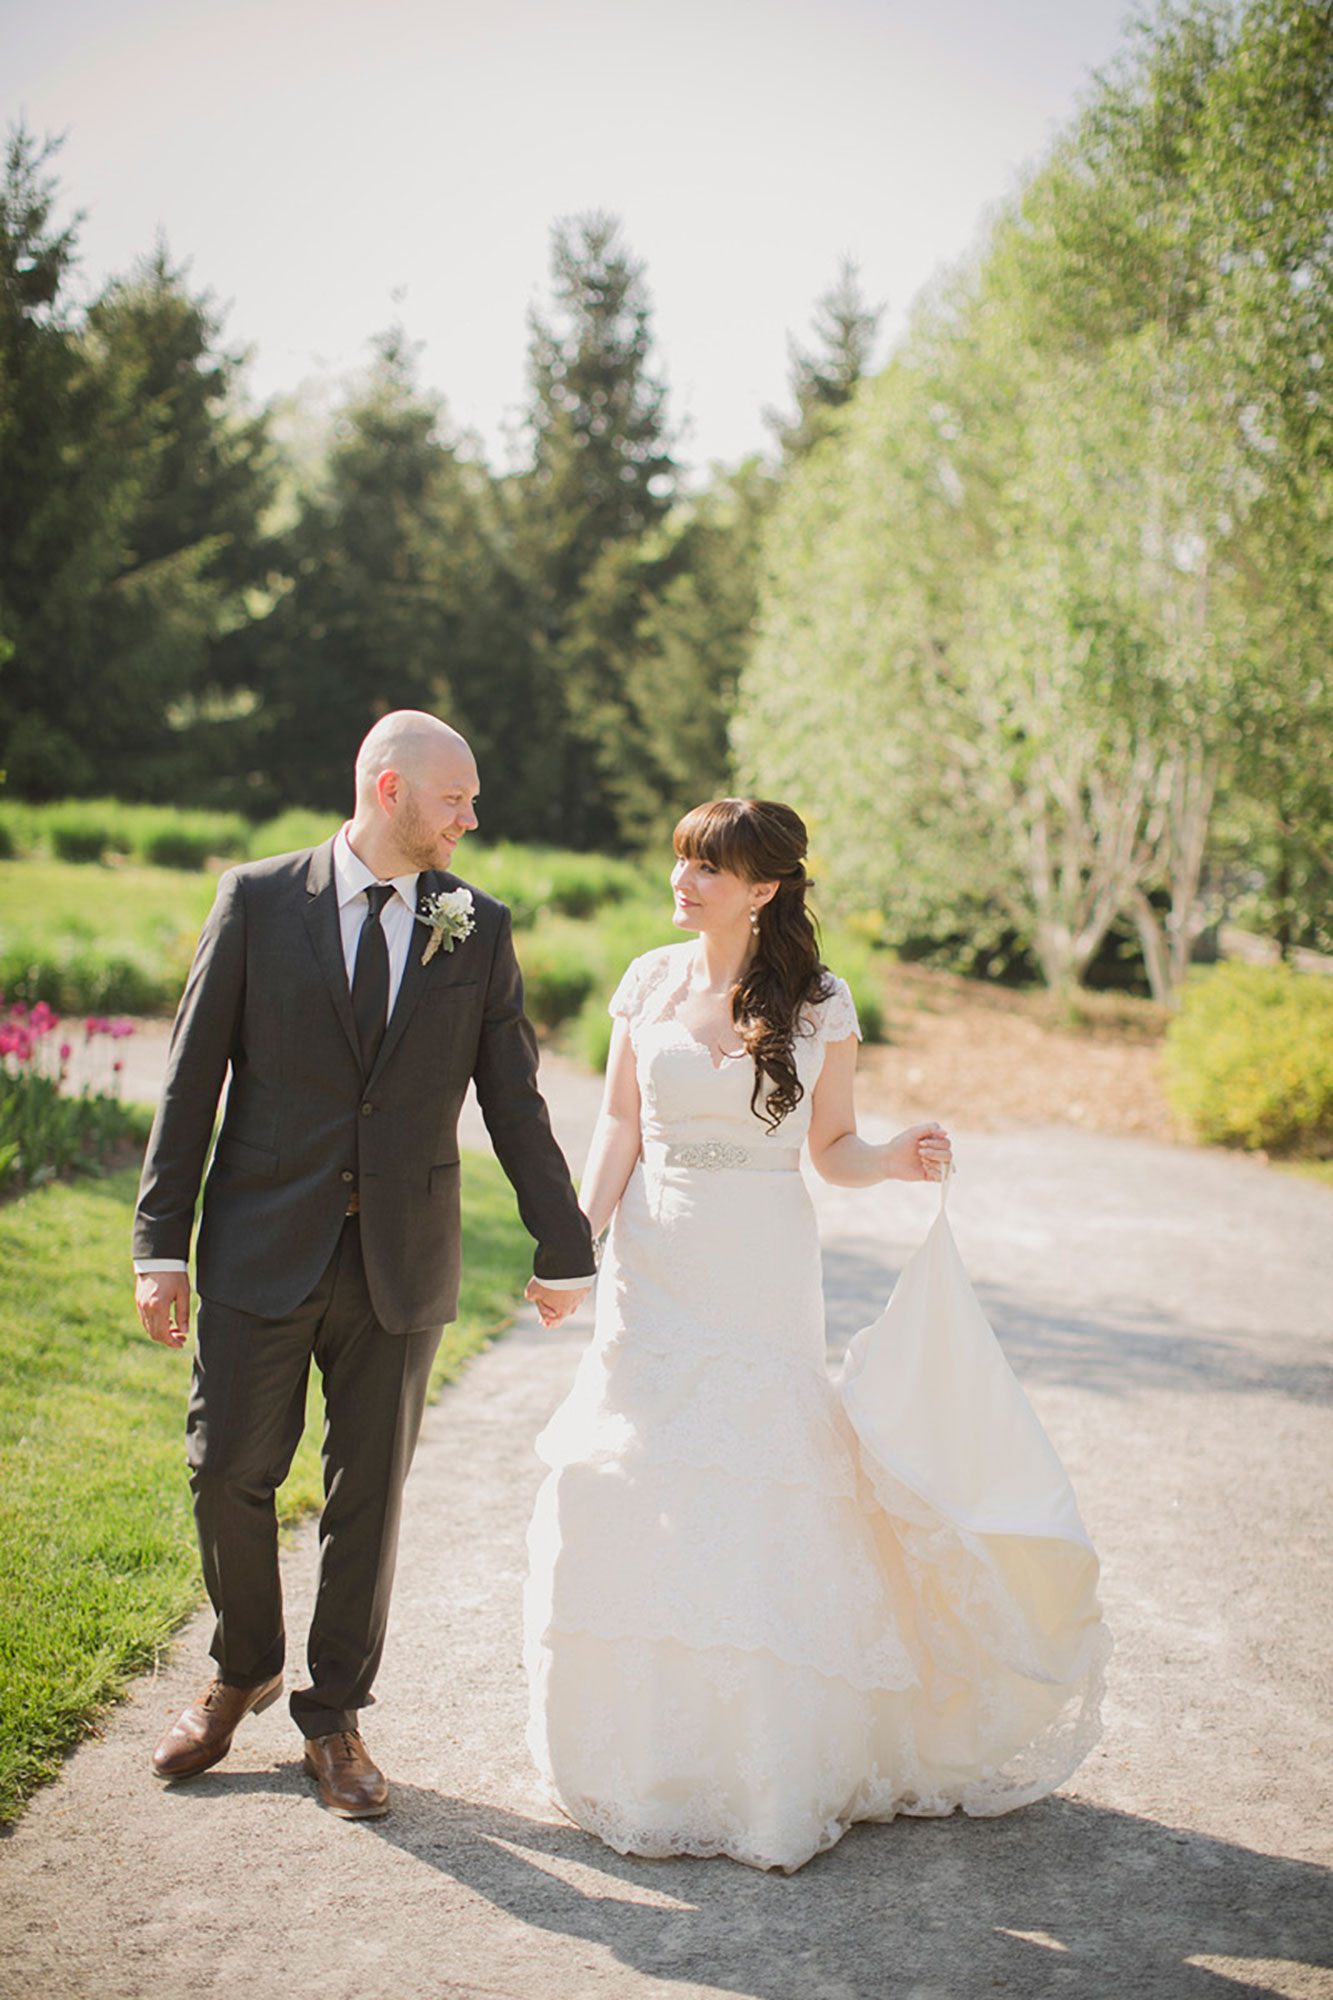 Balls-Falls-Vineyard-Bride-Photo-By-Elizabeth-in-Love-017.jpg